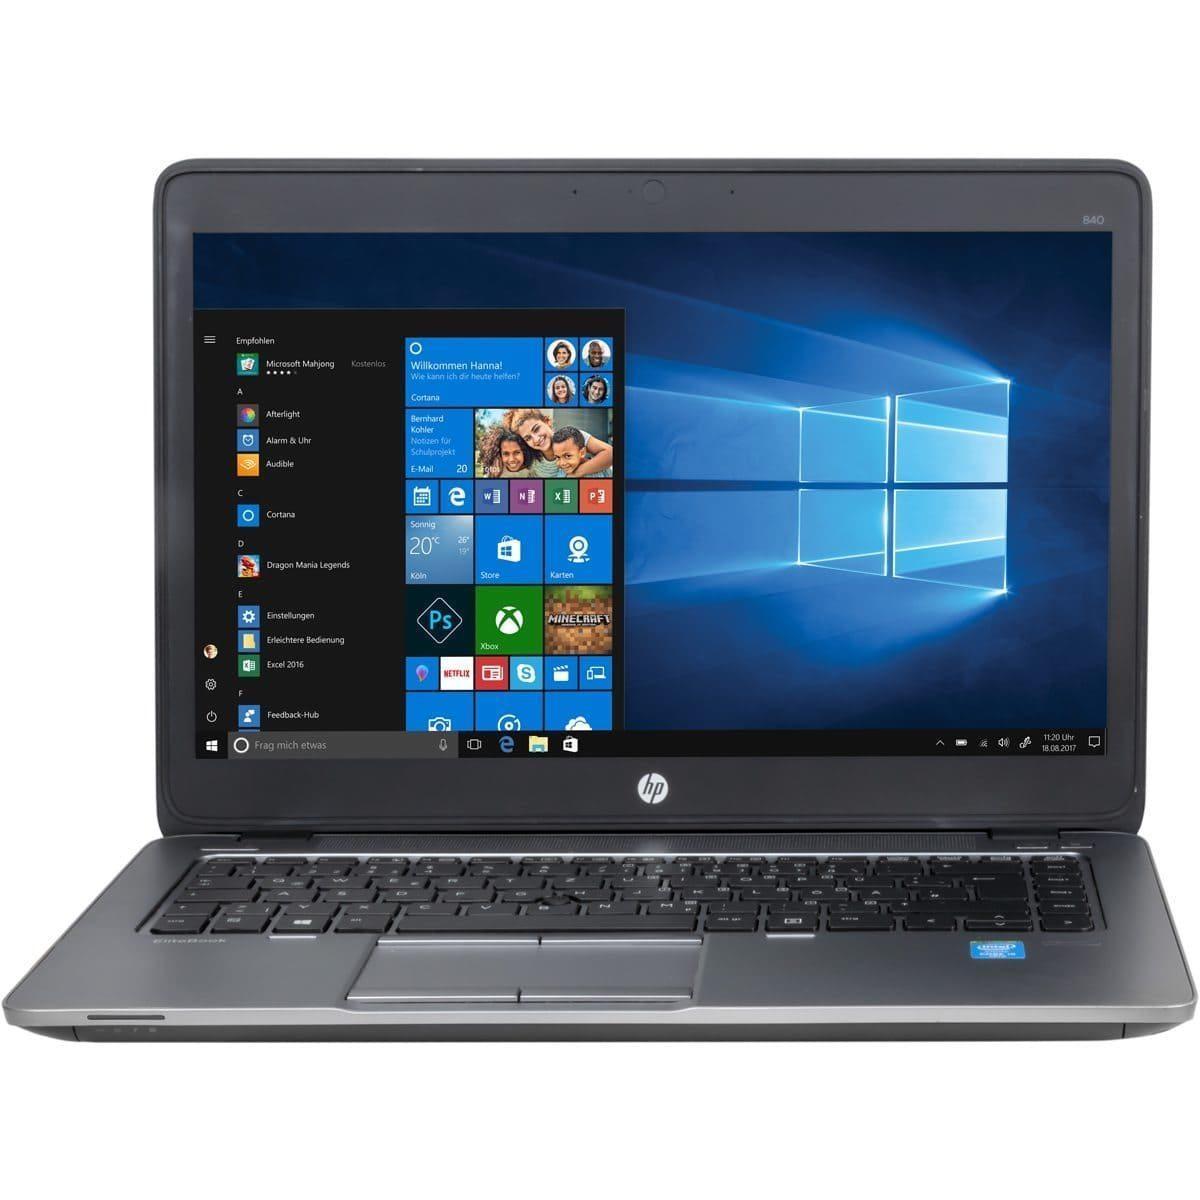 HP Elitebook 840 G2 Laptop gebraucht/generallüberholt- 71351